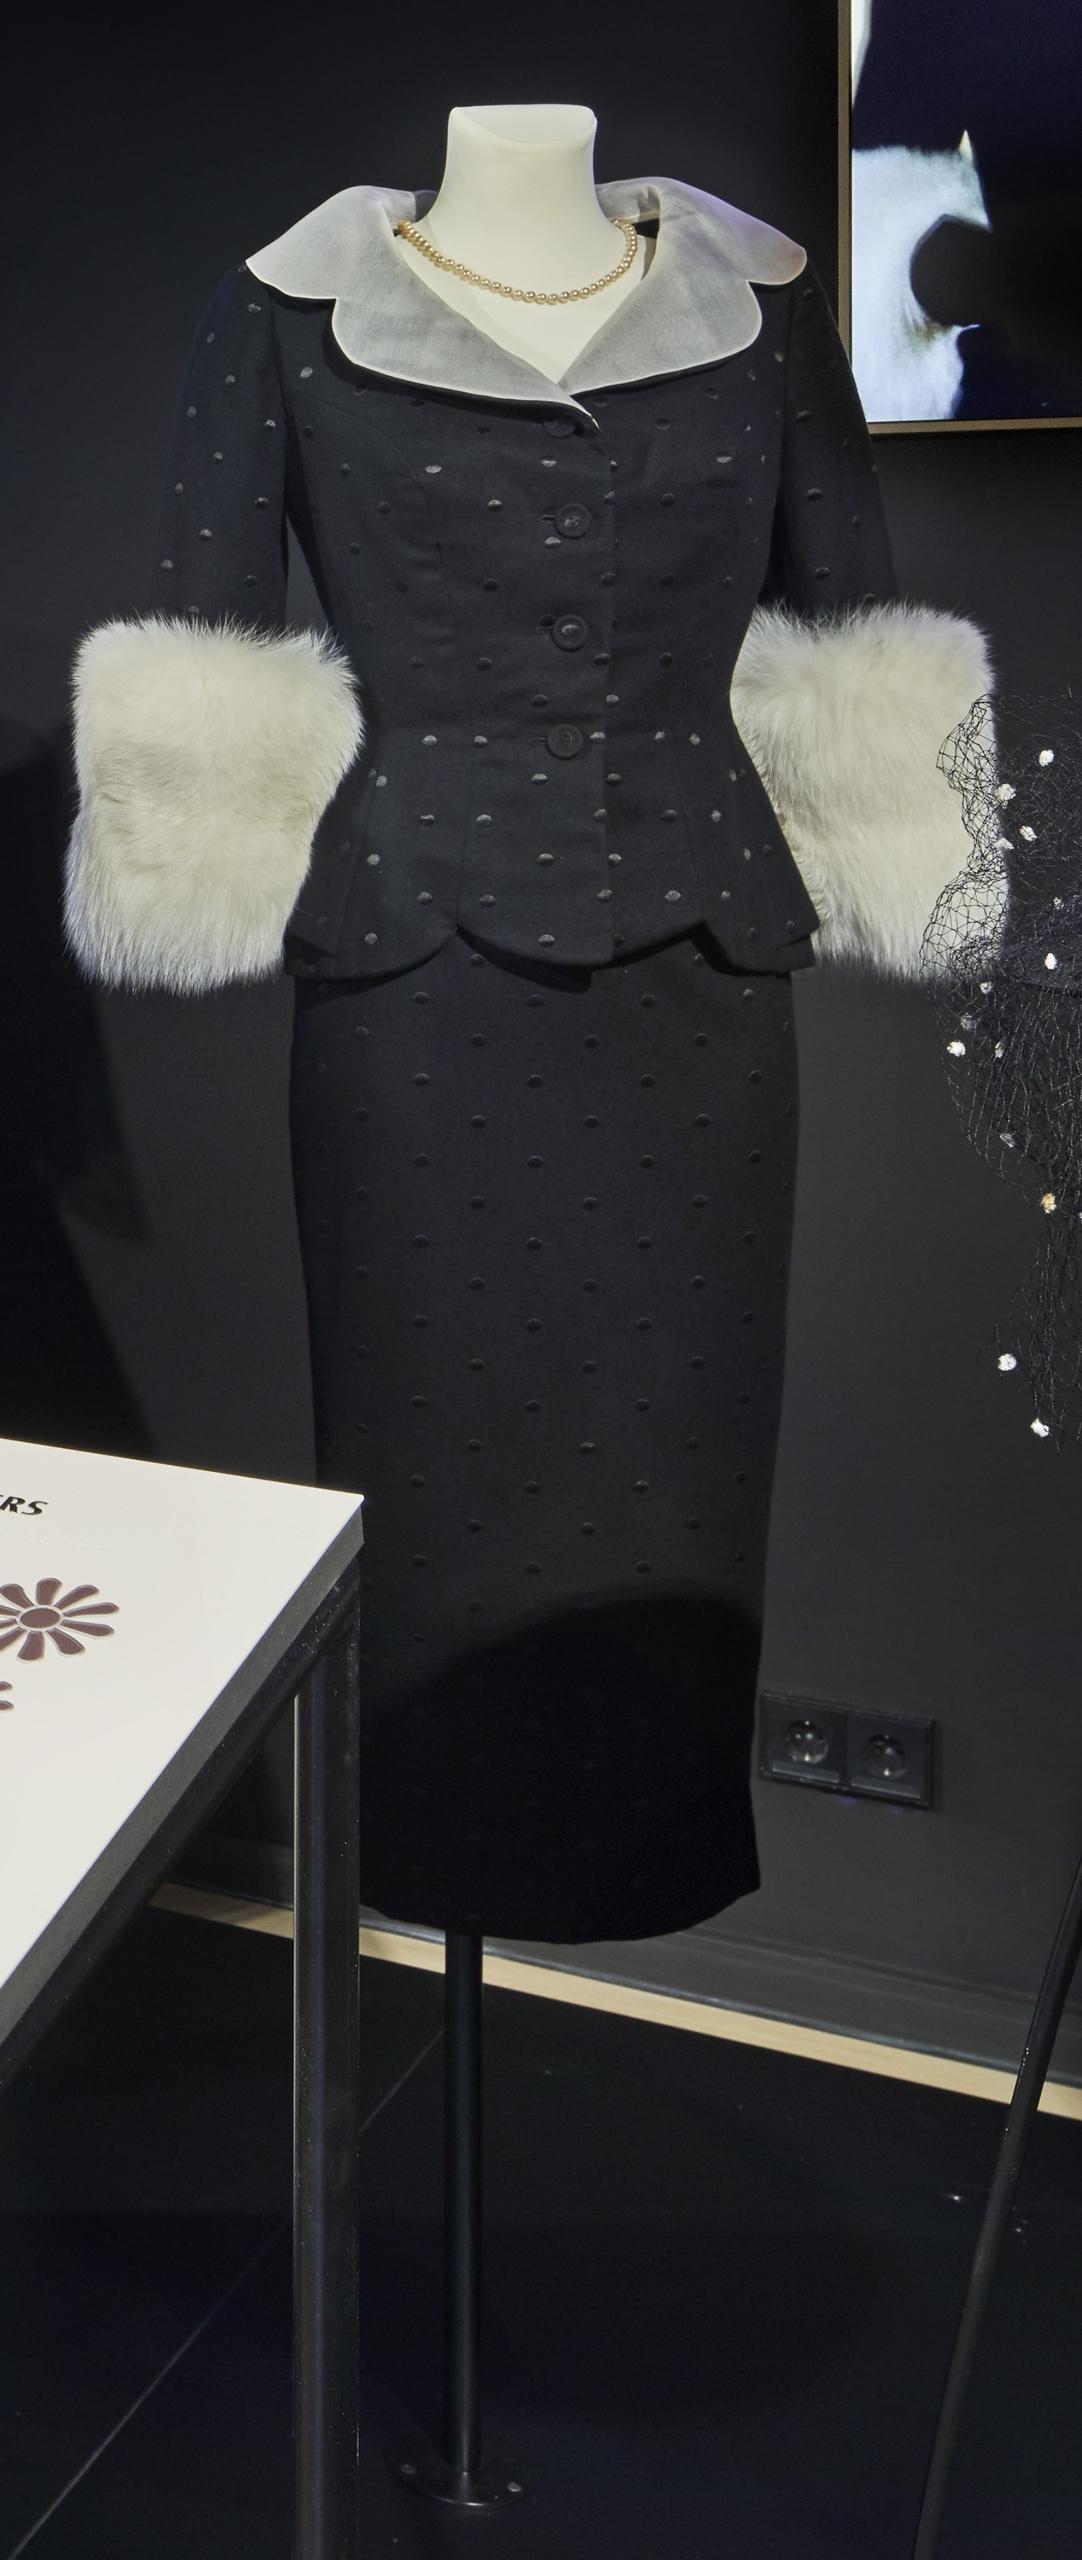 Lola: Kostüm mit Pelzbesatz für Barbara Sukowa als Lola